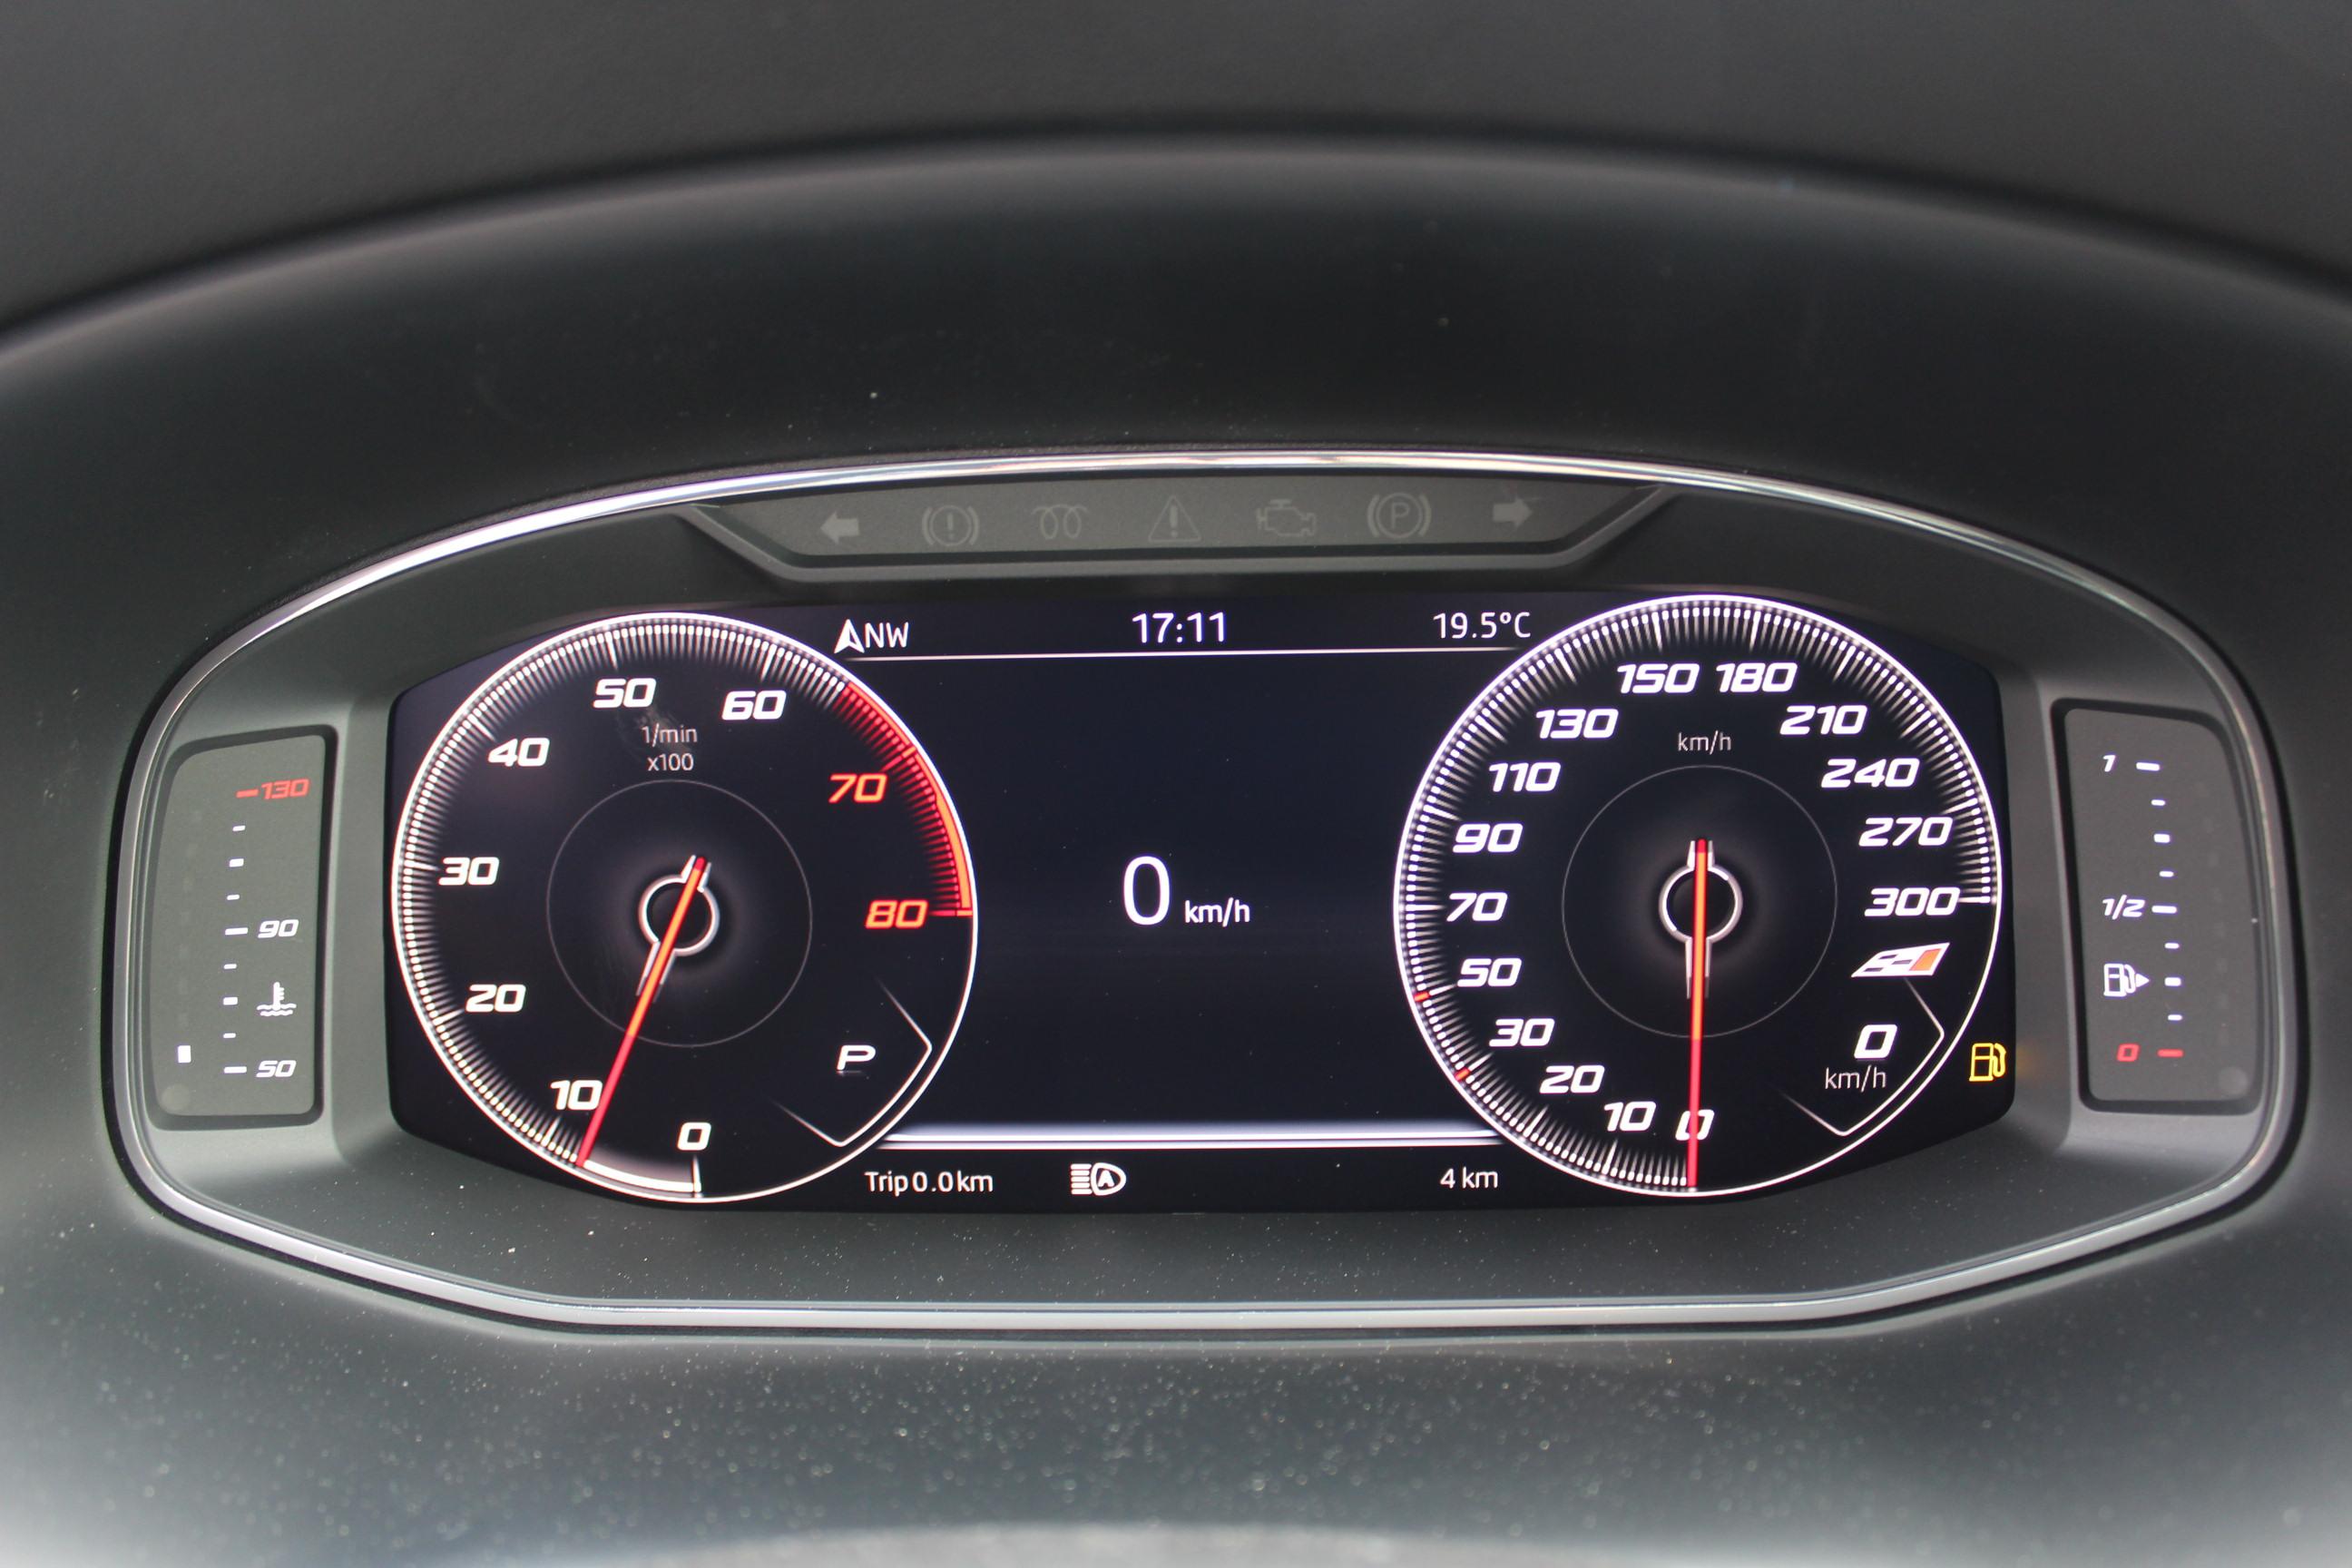 Seat Leon ST Cupra Kombi 2.0 TSI DSG 4x4 / Deutsche Neufahrzeuge und EU-Neufahrzeuge – Aha! Fahrzeughandel GmbH in Althengstett